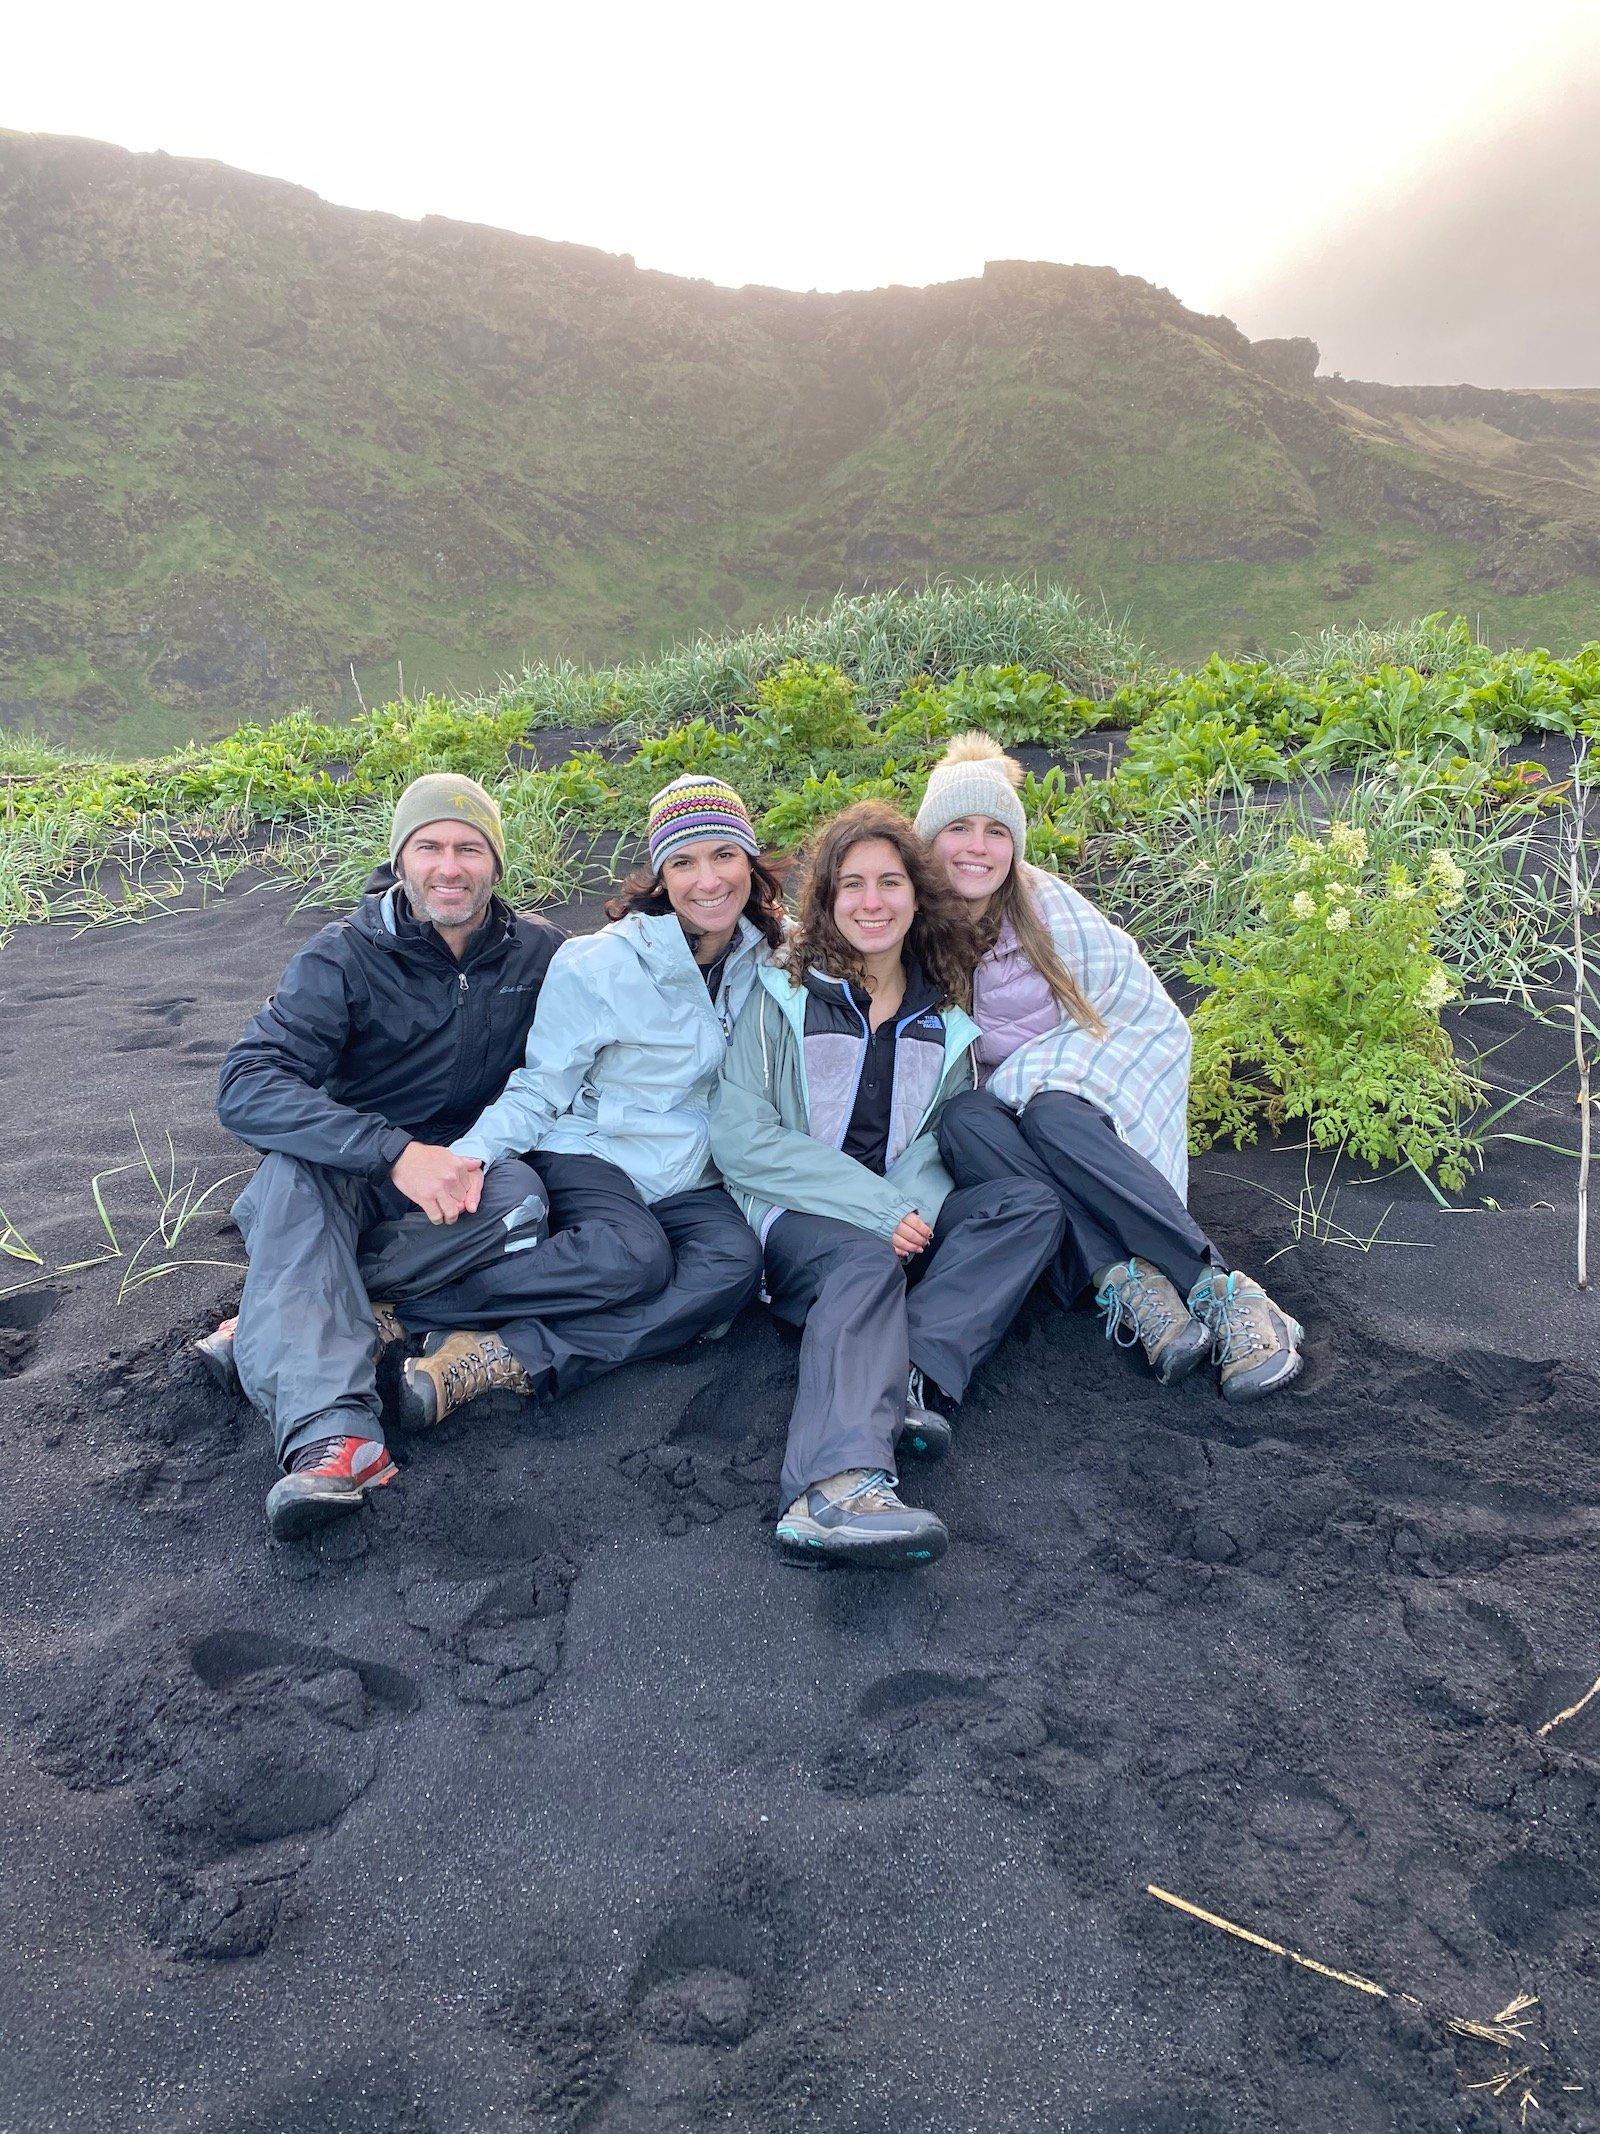 Family posing on black beach in Iceland.